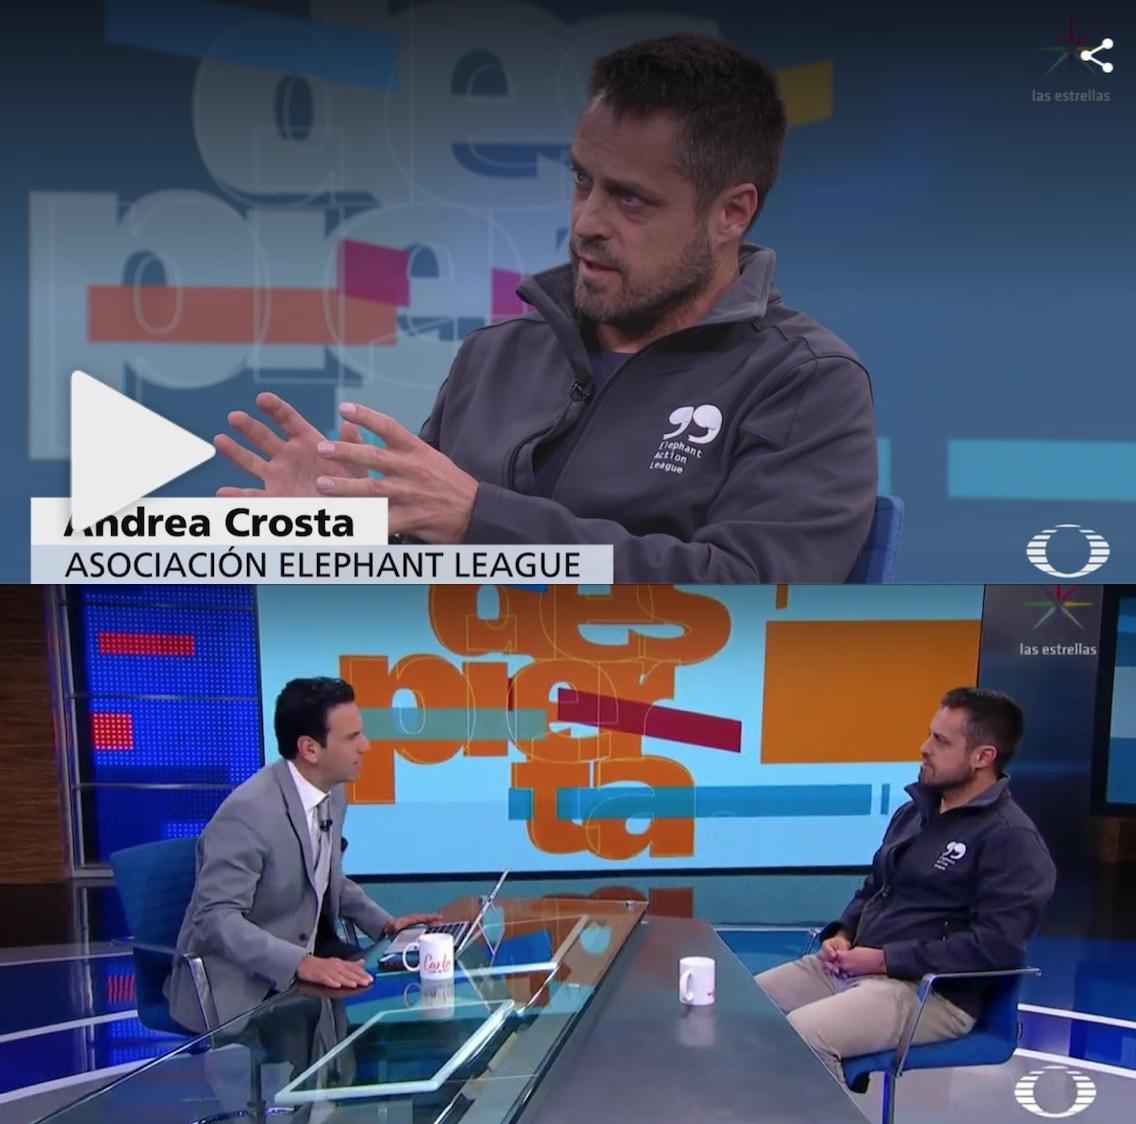 Carlos Loret and Andrea Crosta